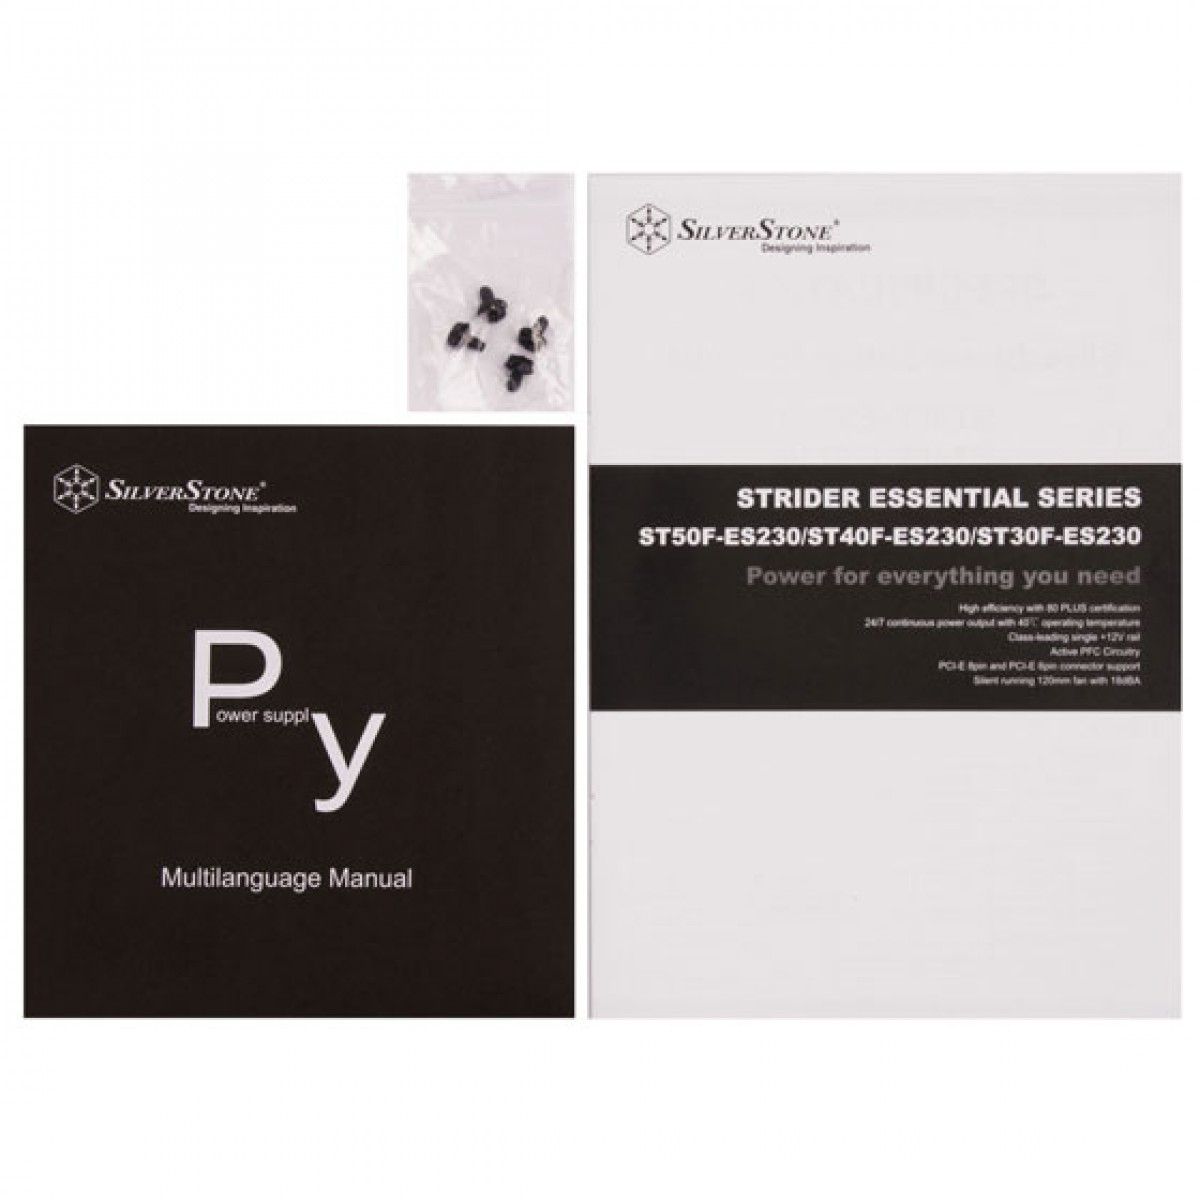 Fonte SilverStone SST-ST50F-ES230, 500W, 80 Plus, PFC Ativo, SST-ST50F-ES230 (APENAS 220V)